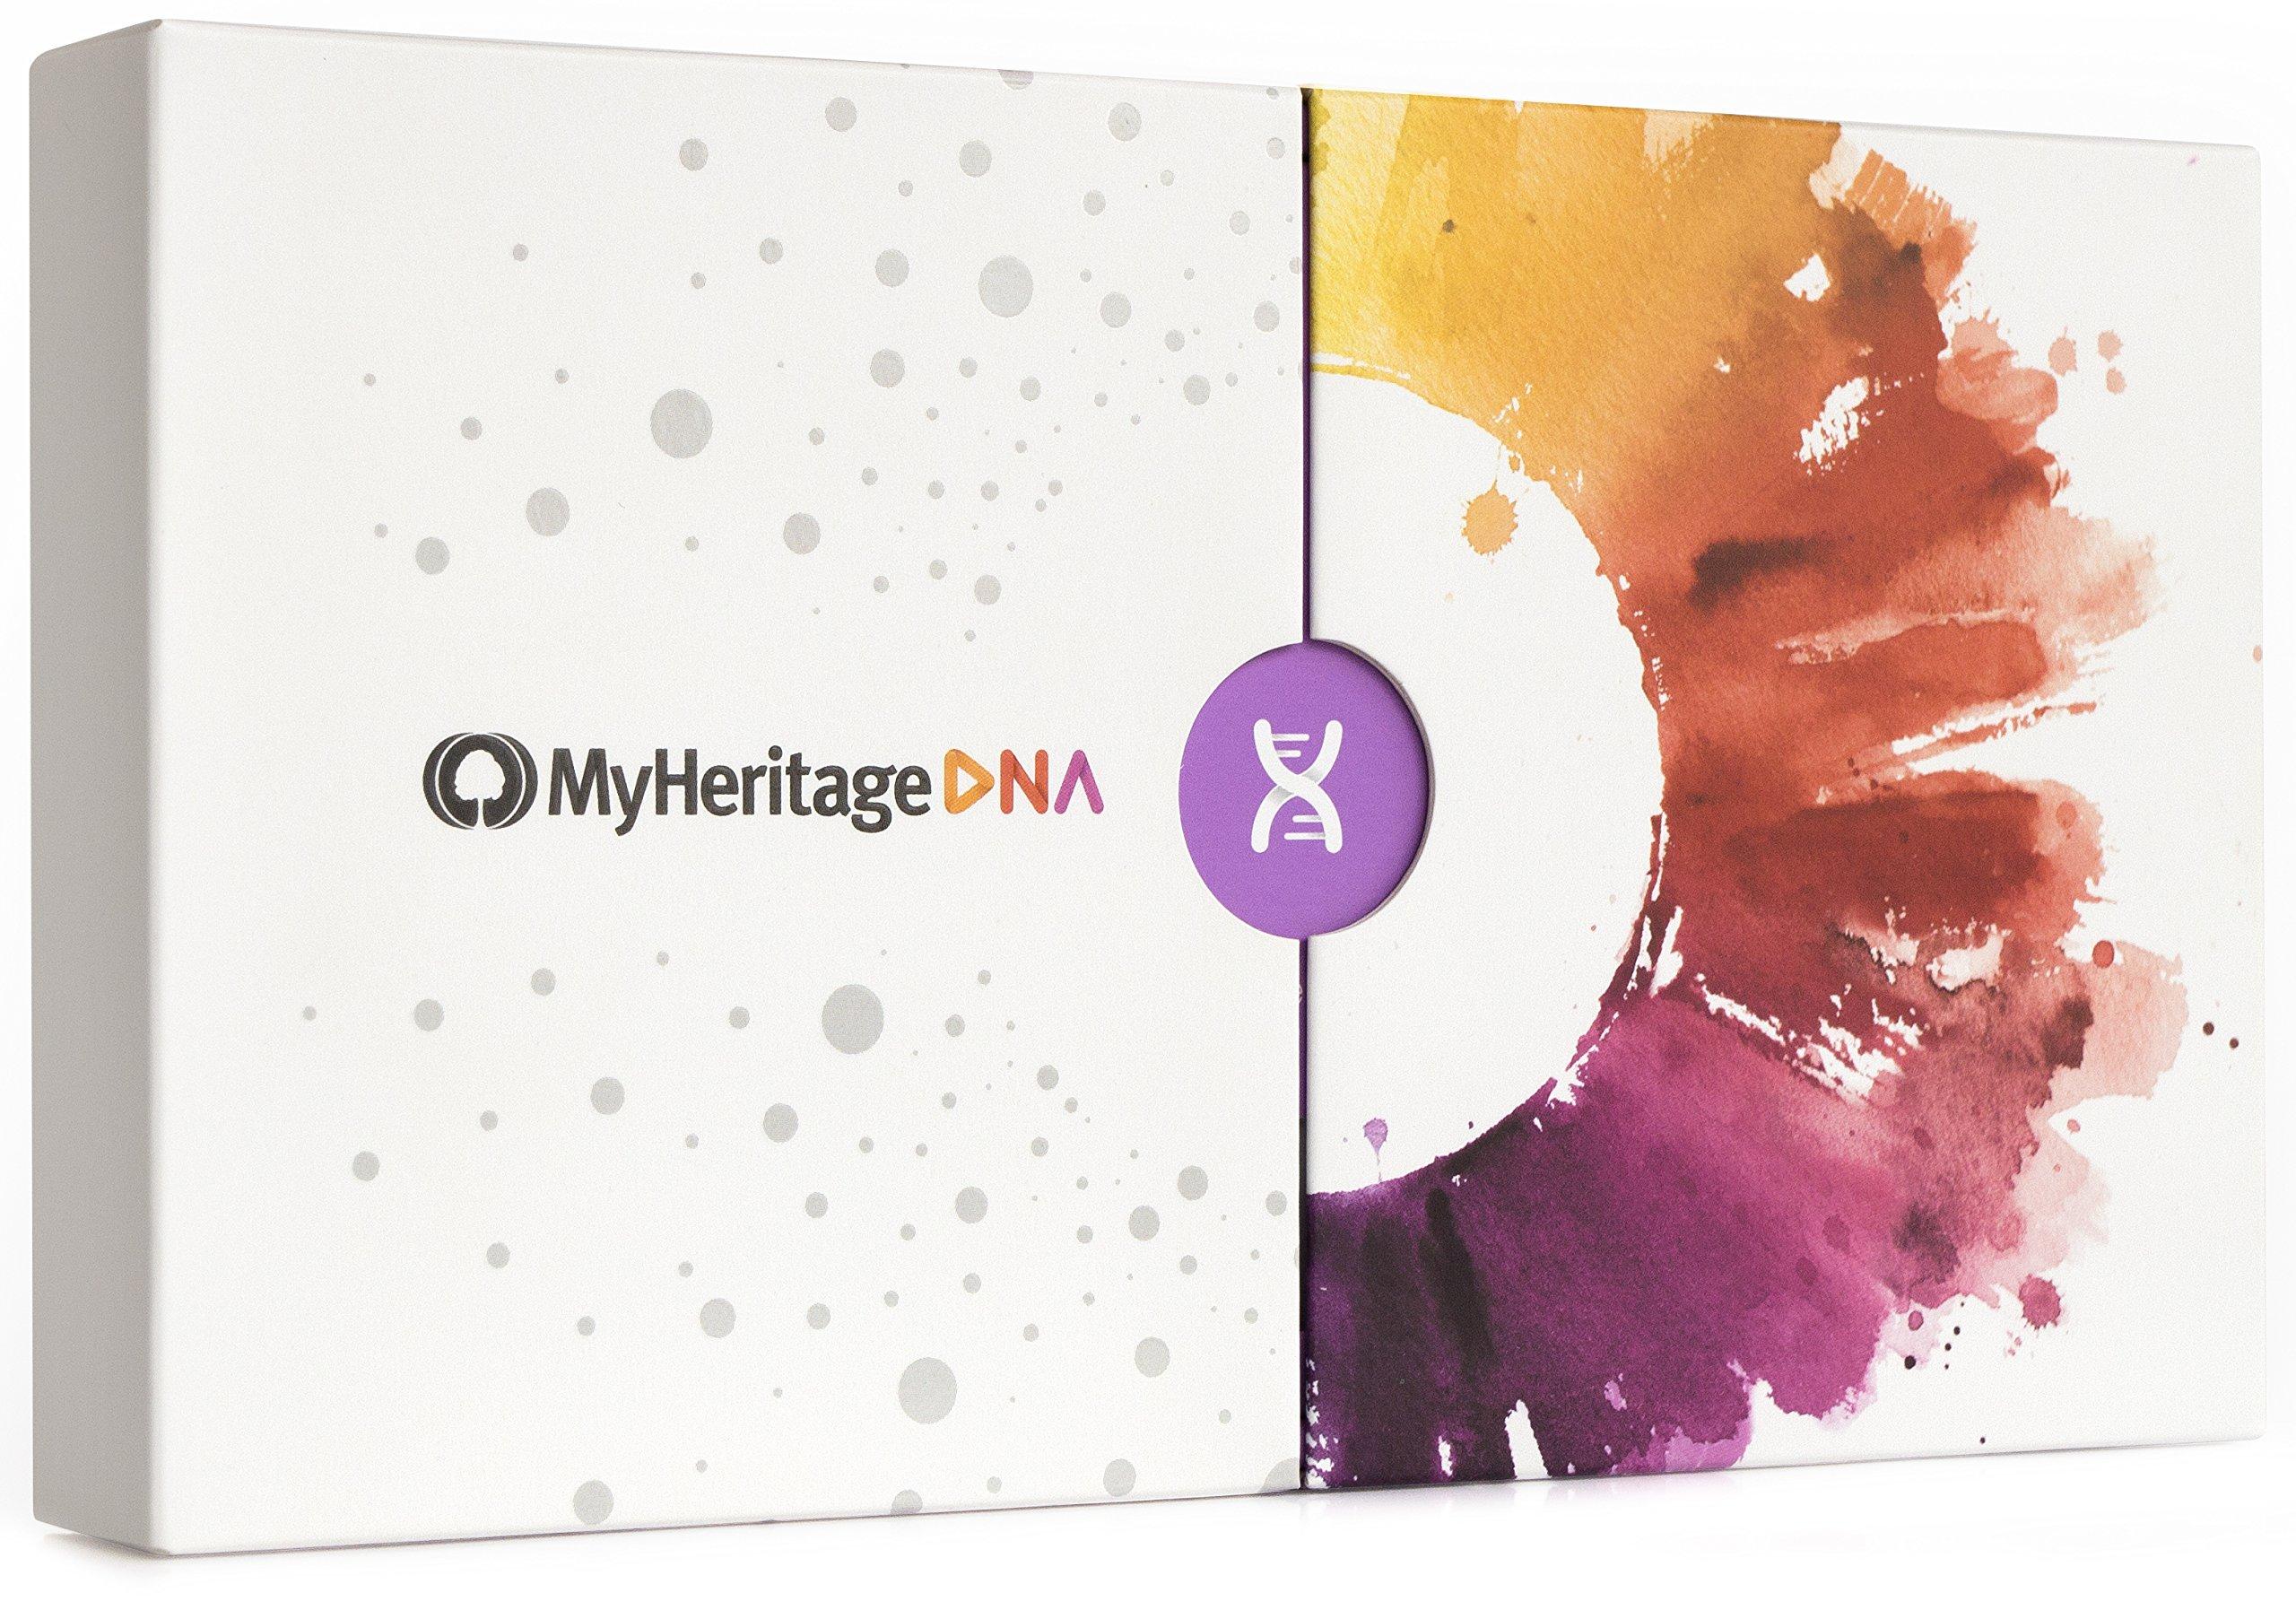 Amazon.com: MyHeritage DNA Test Kit - Ancestry & Ethnicity Genetic ...